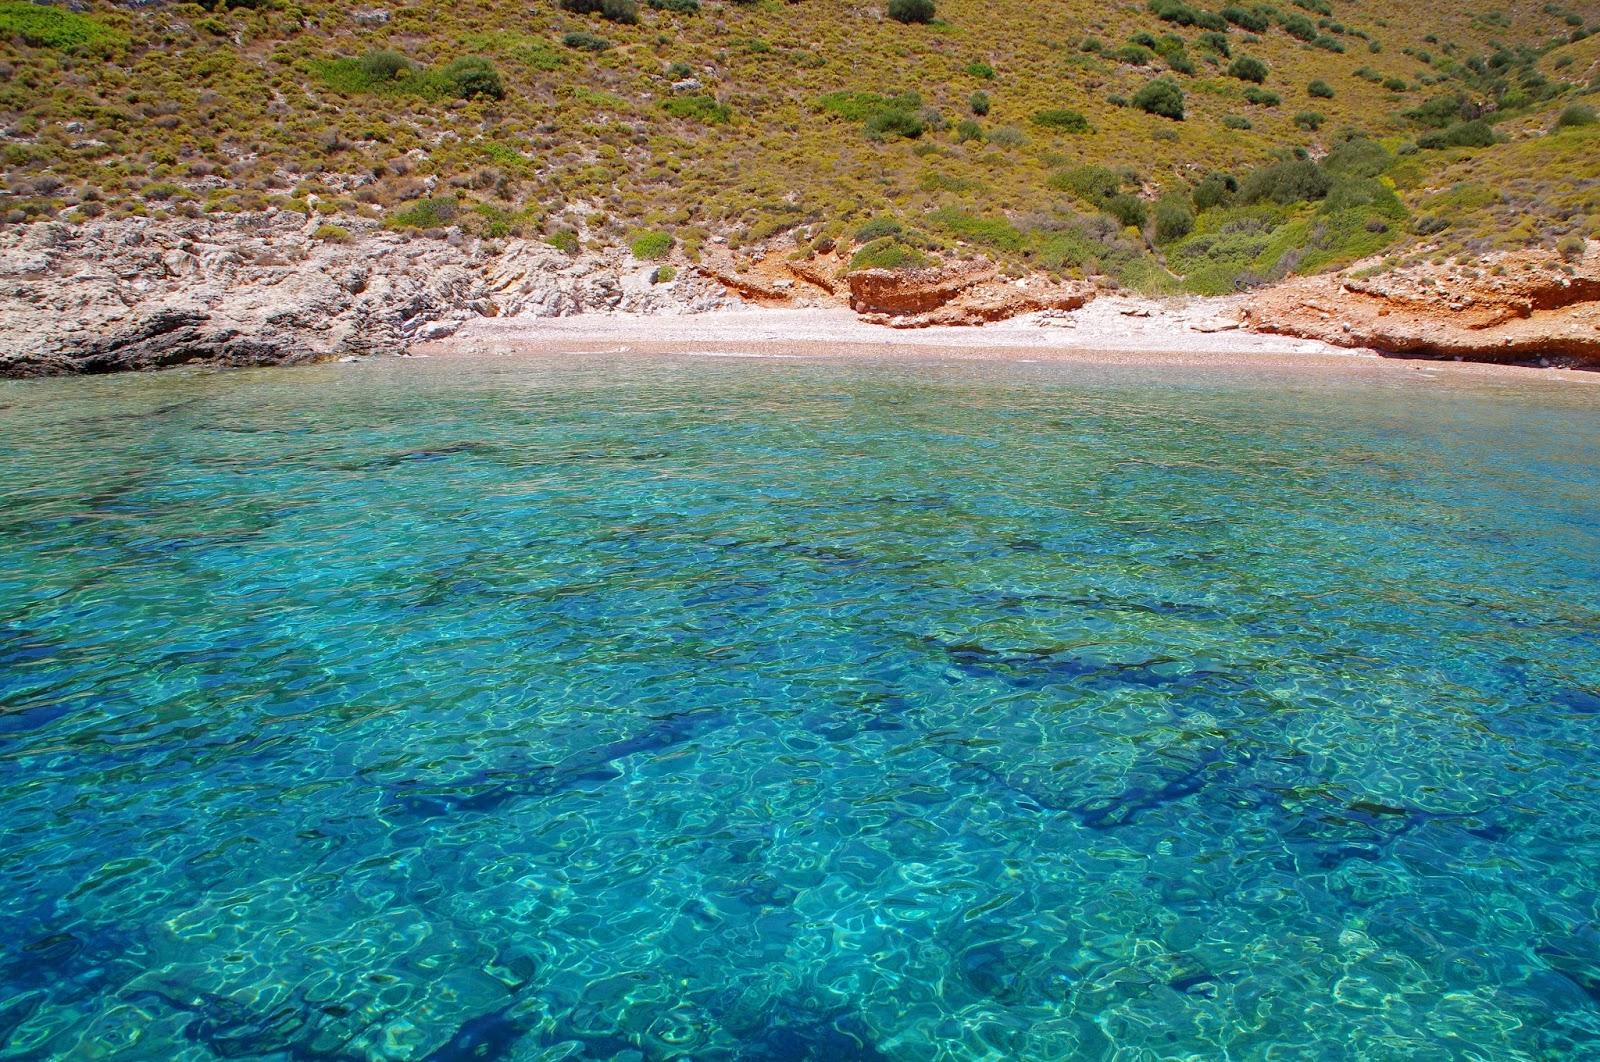 Crystal Clear Water in Turkey